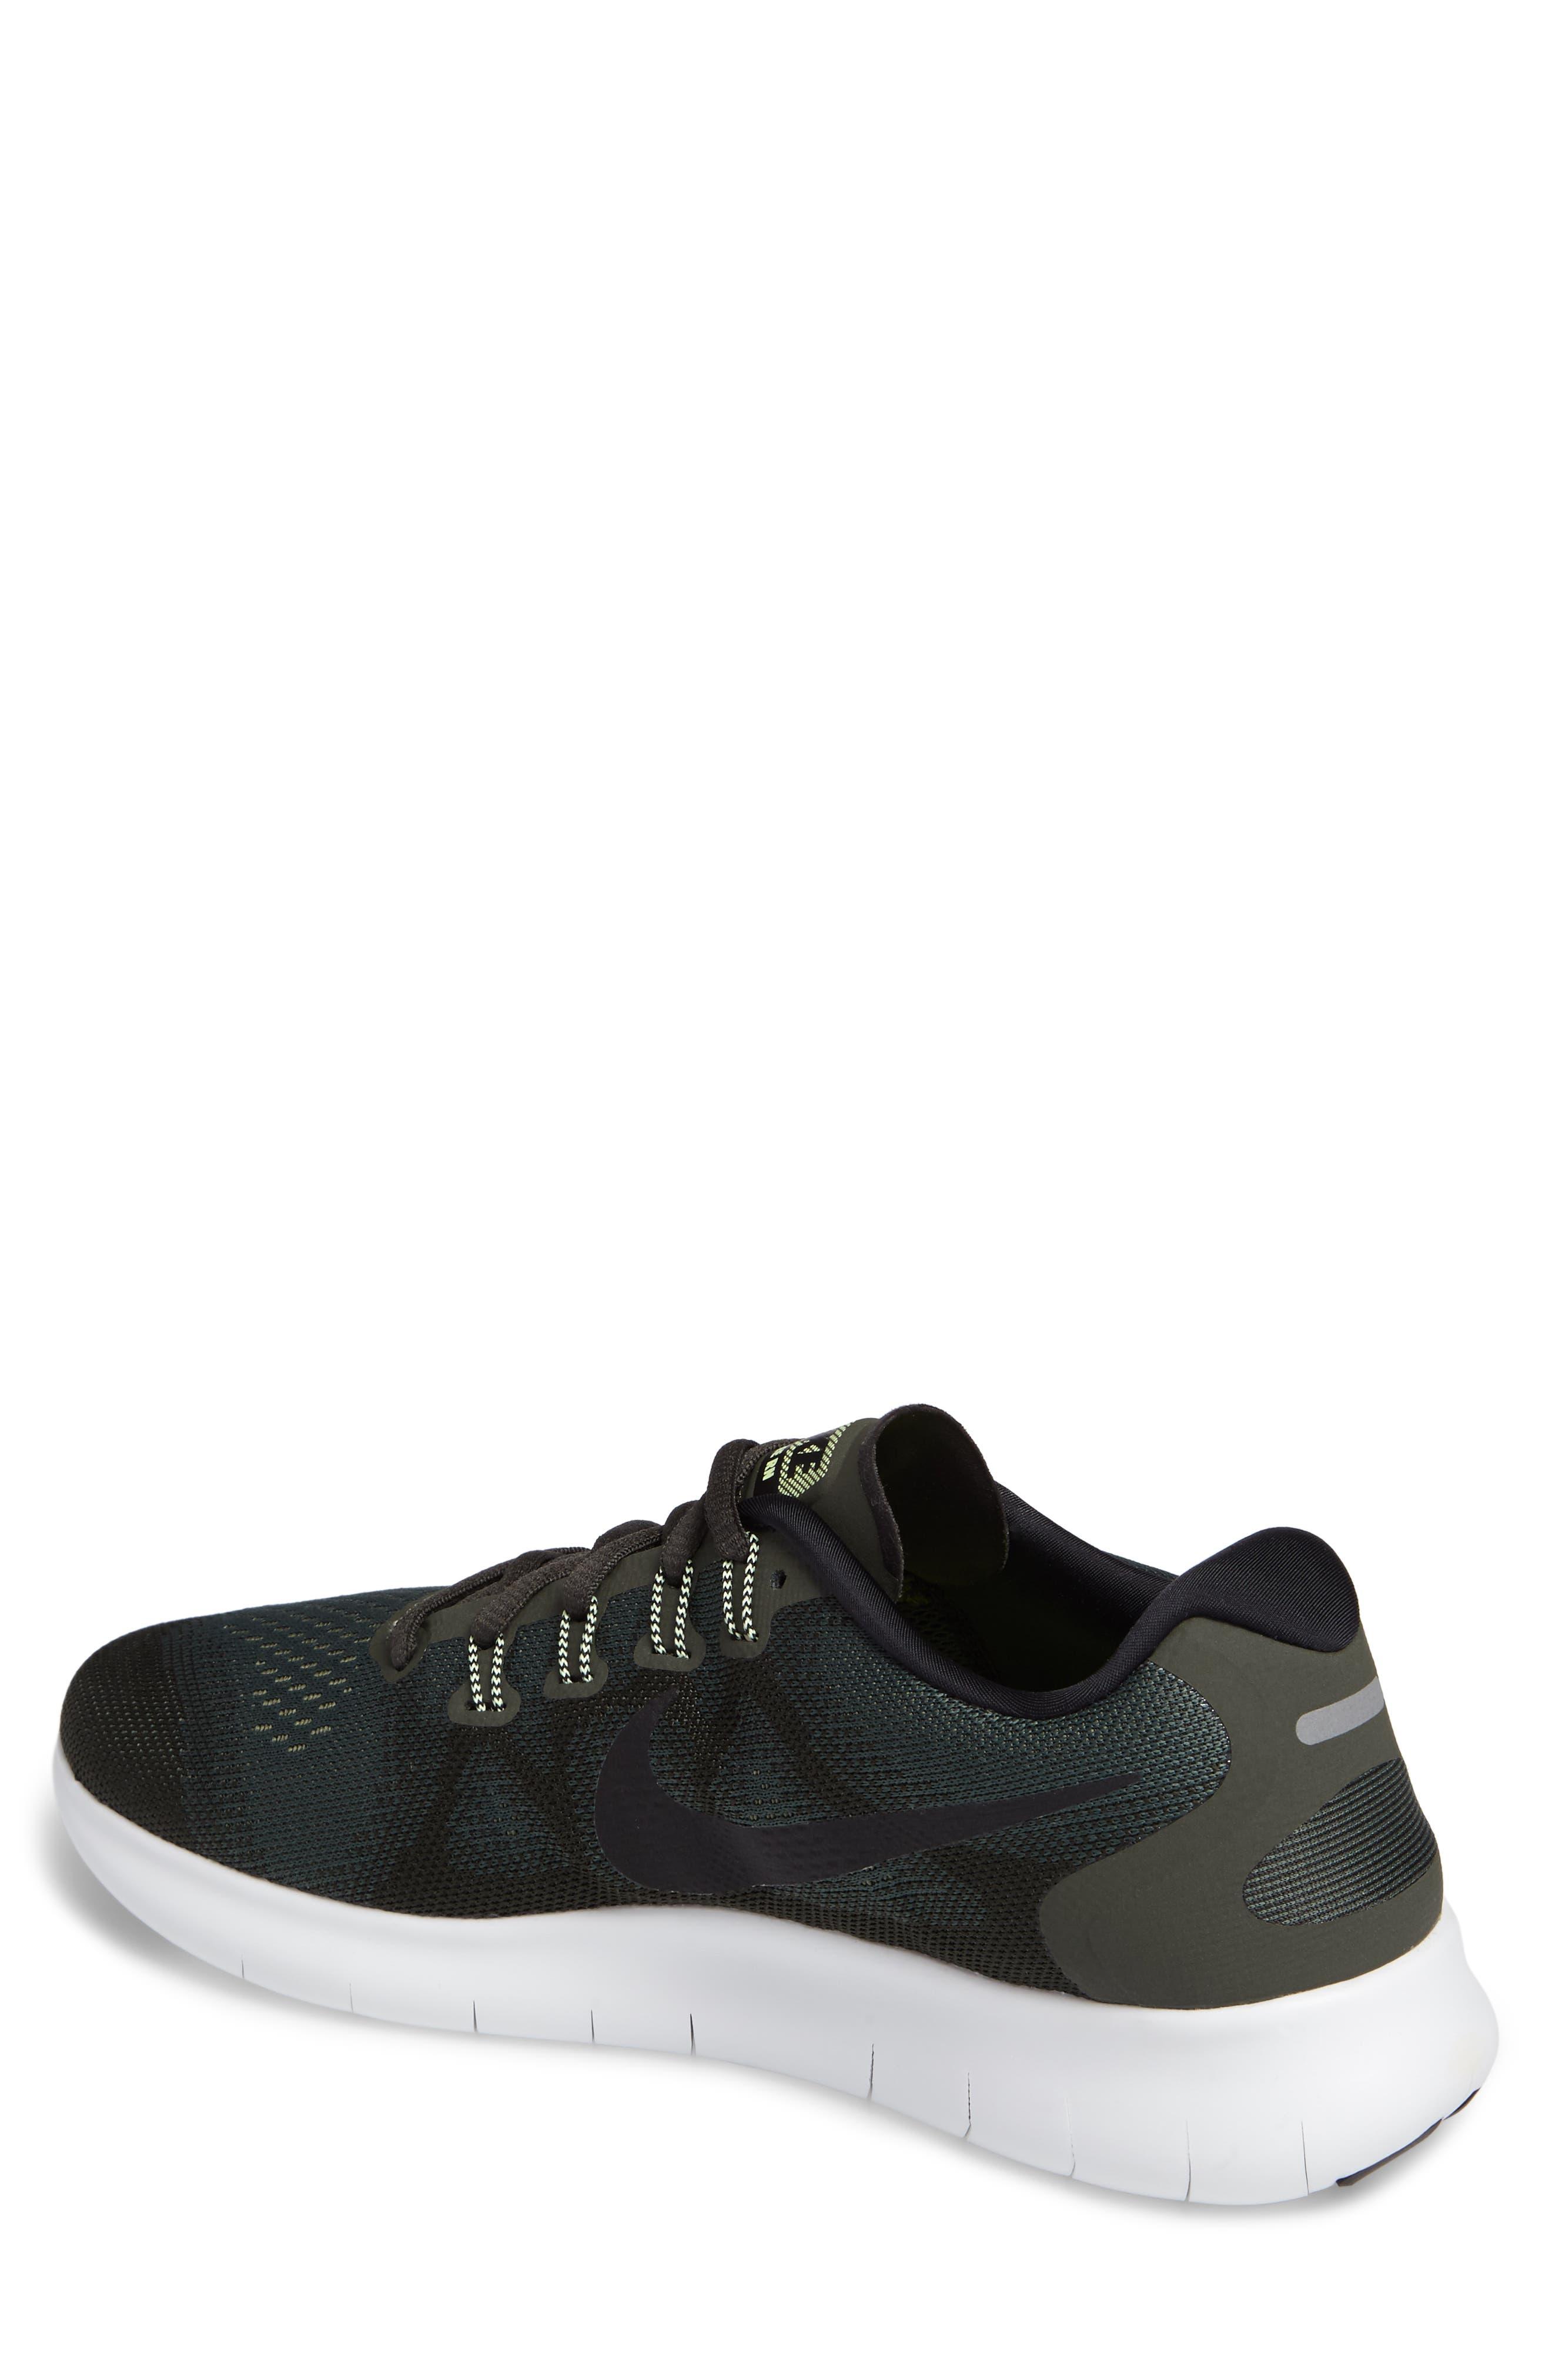 Free Run 2017 Running Shoe,                             Alternate thumbnail 22, color,